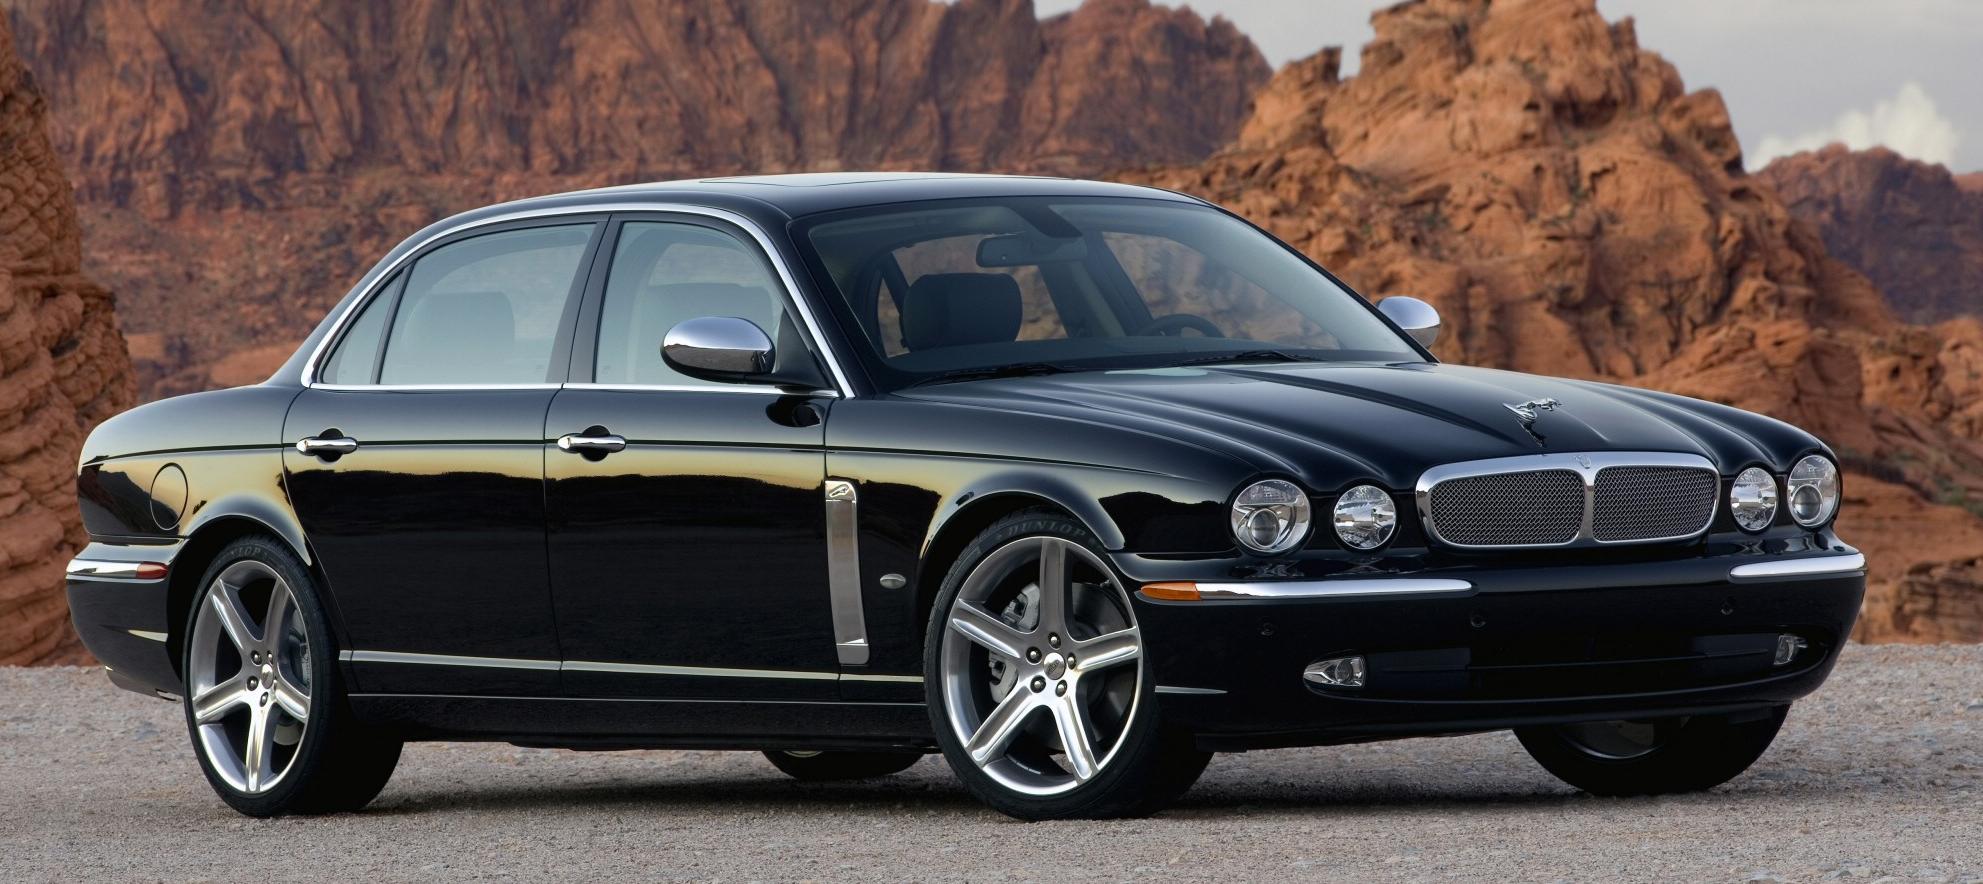 2004 Jaguar Super V8 Supercars Net